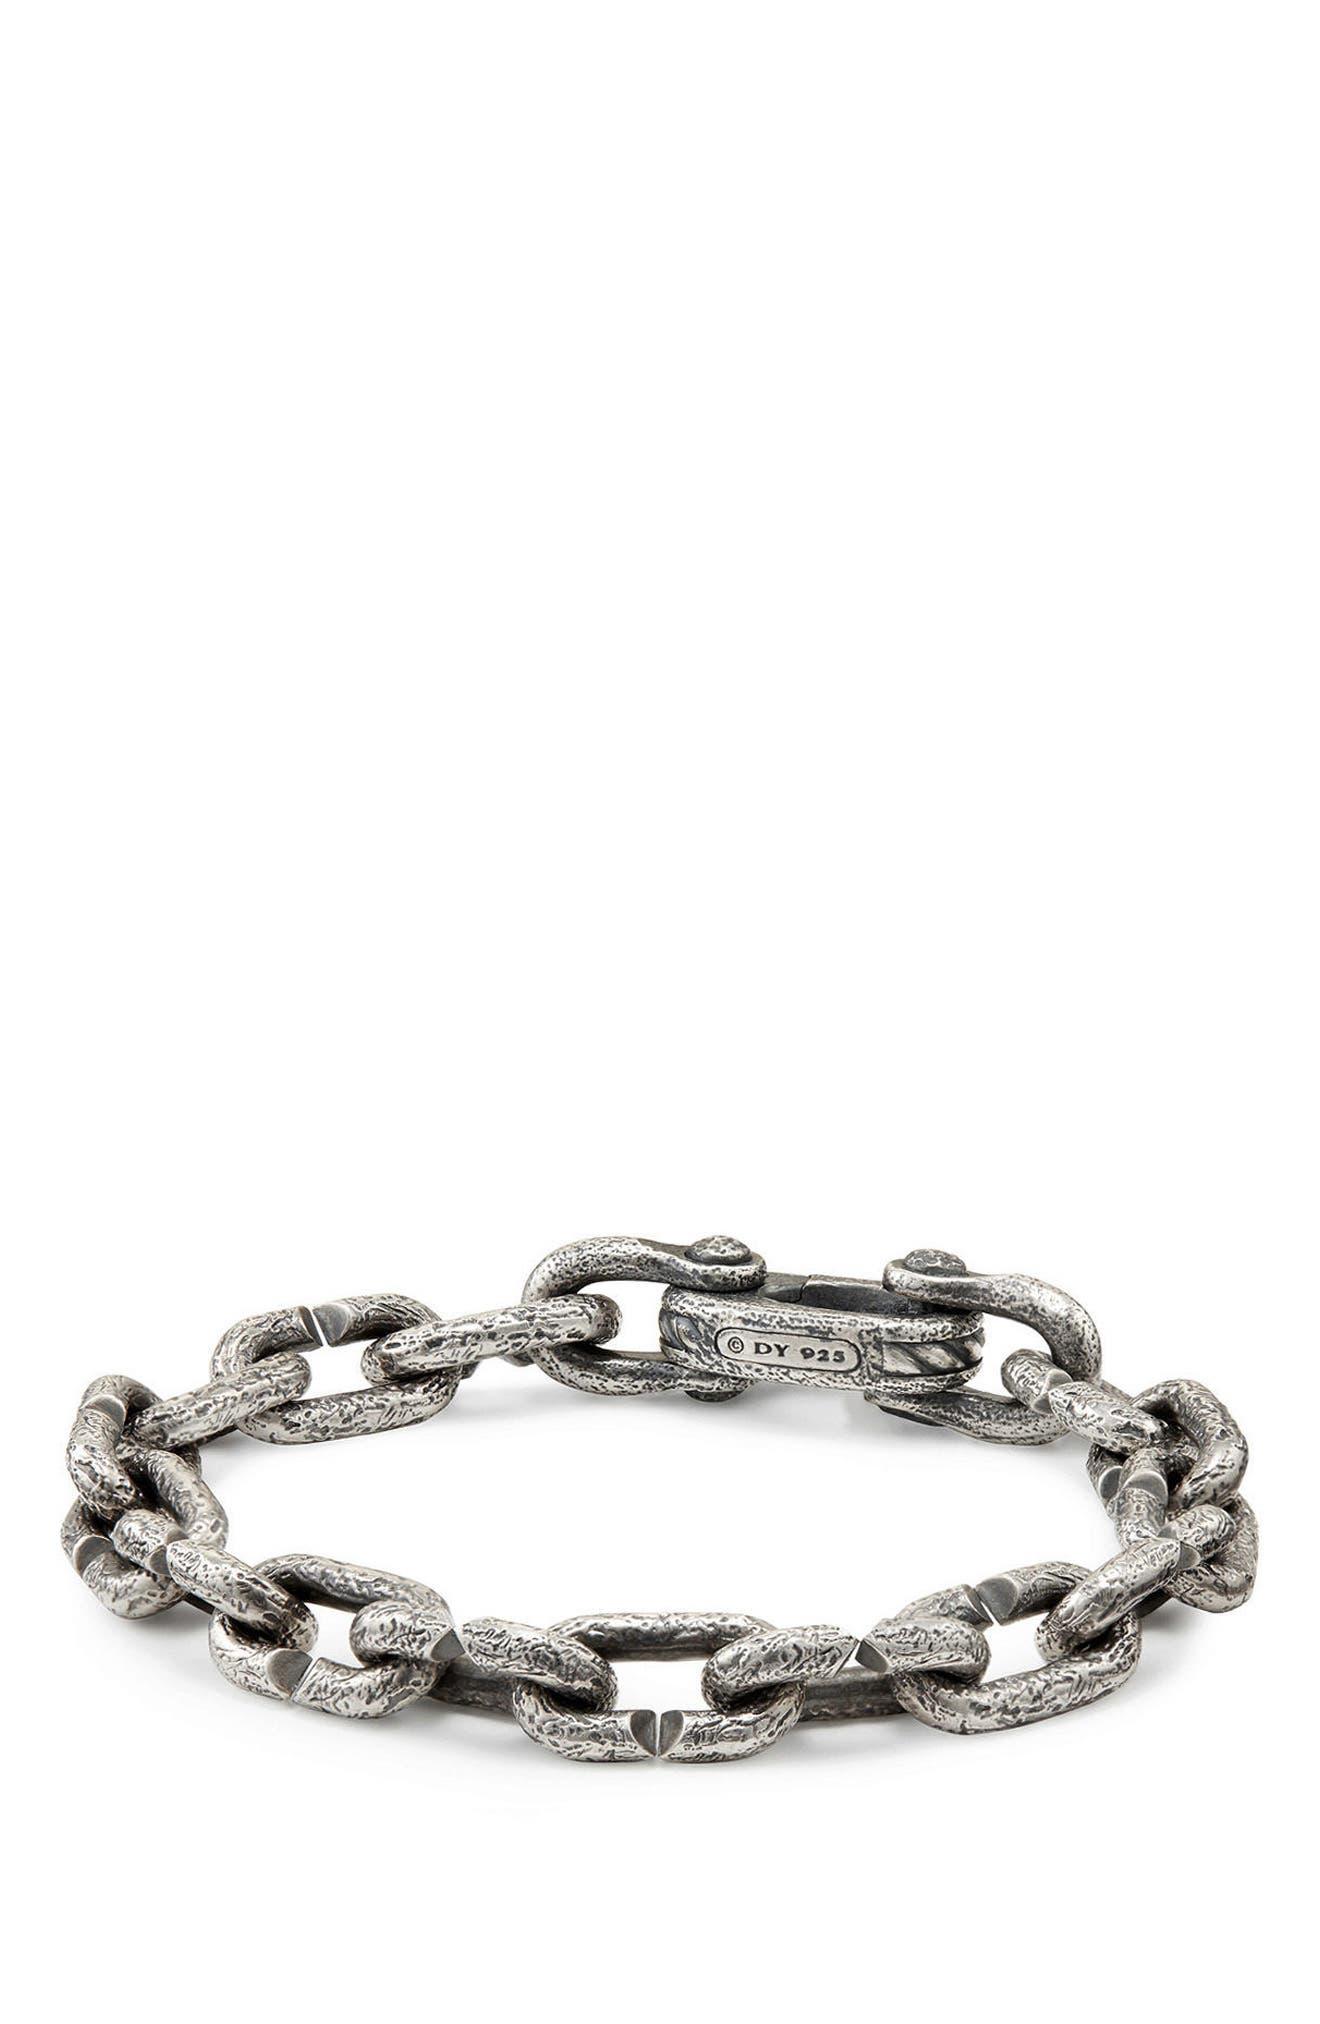 DAVID YURMAN Shipwreck Chain Bracelet, Main, color, SILVER